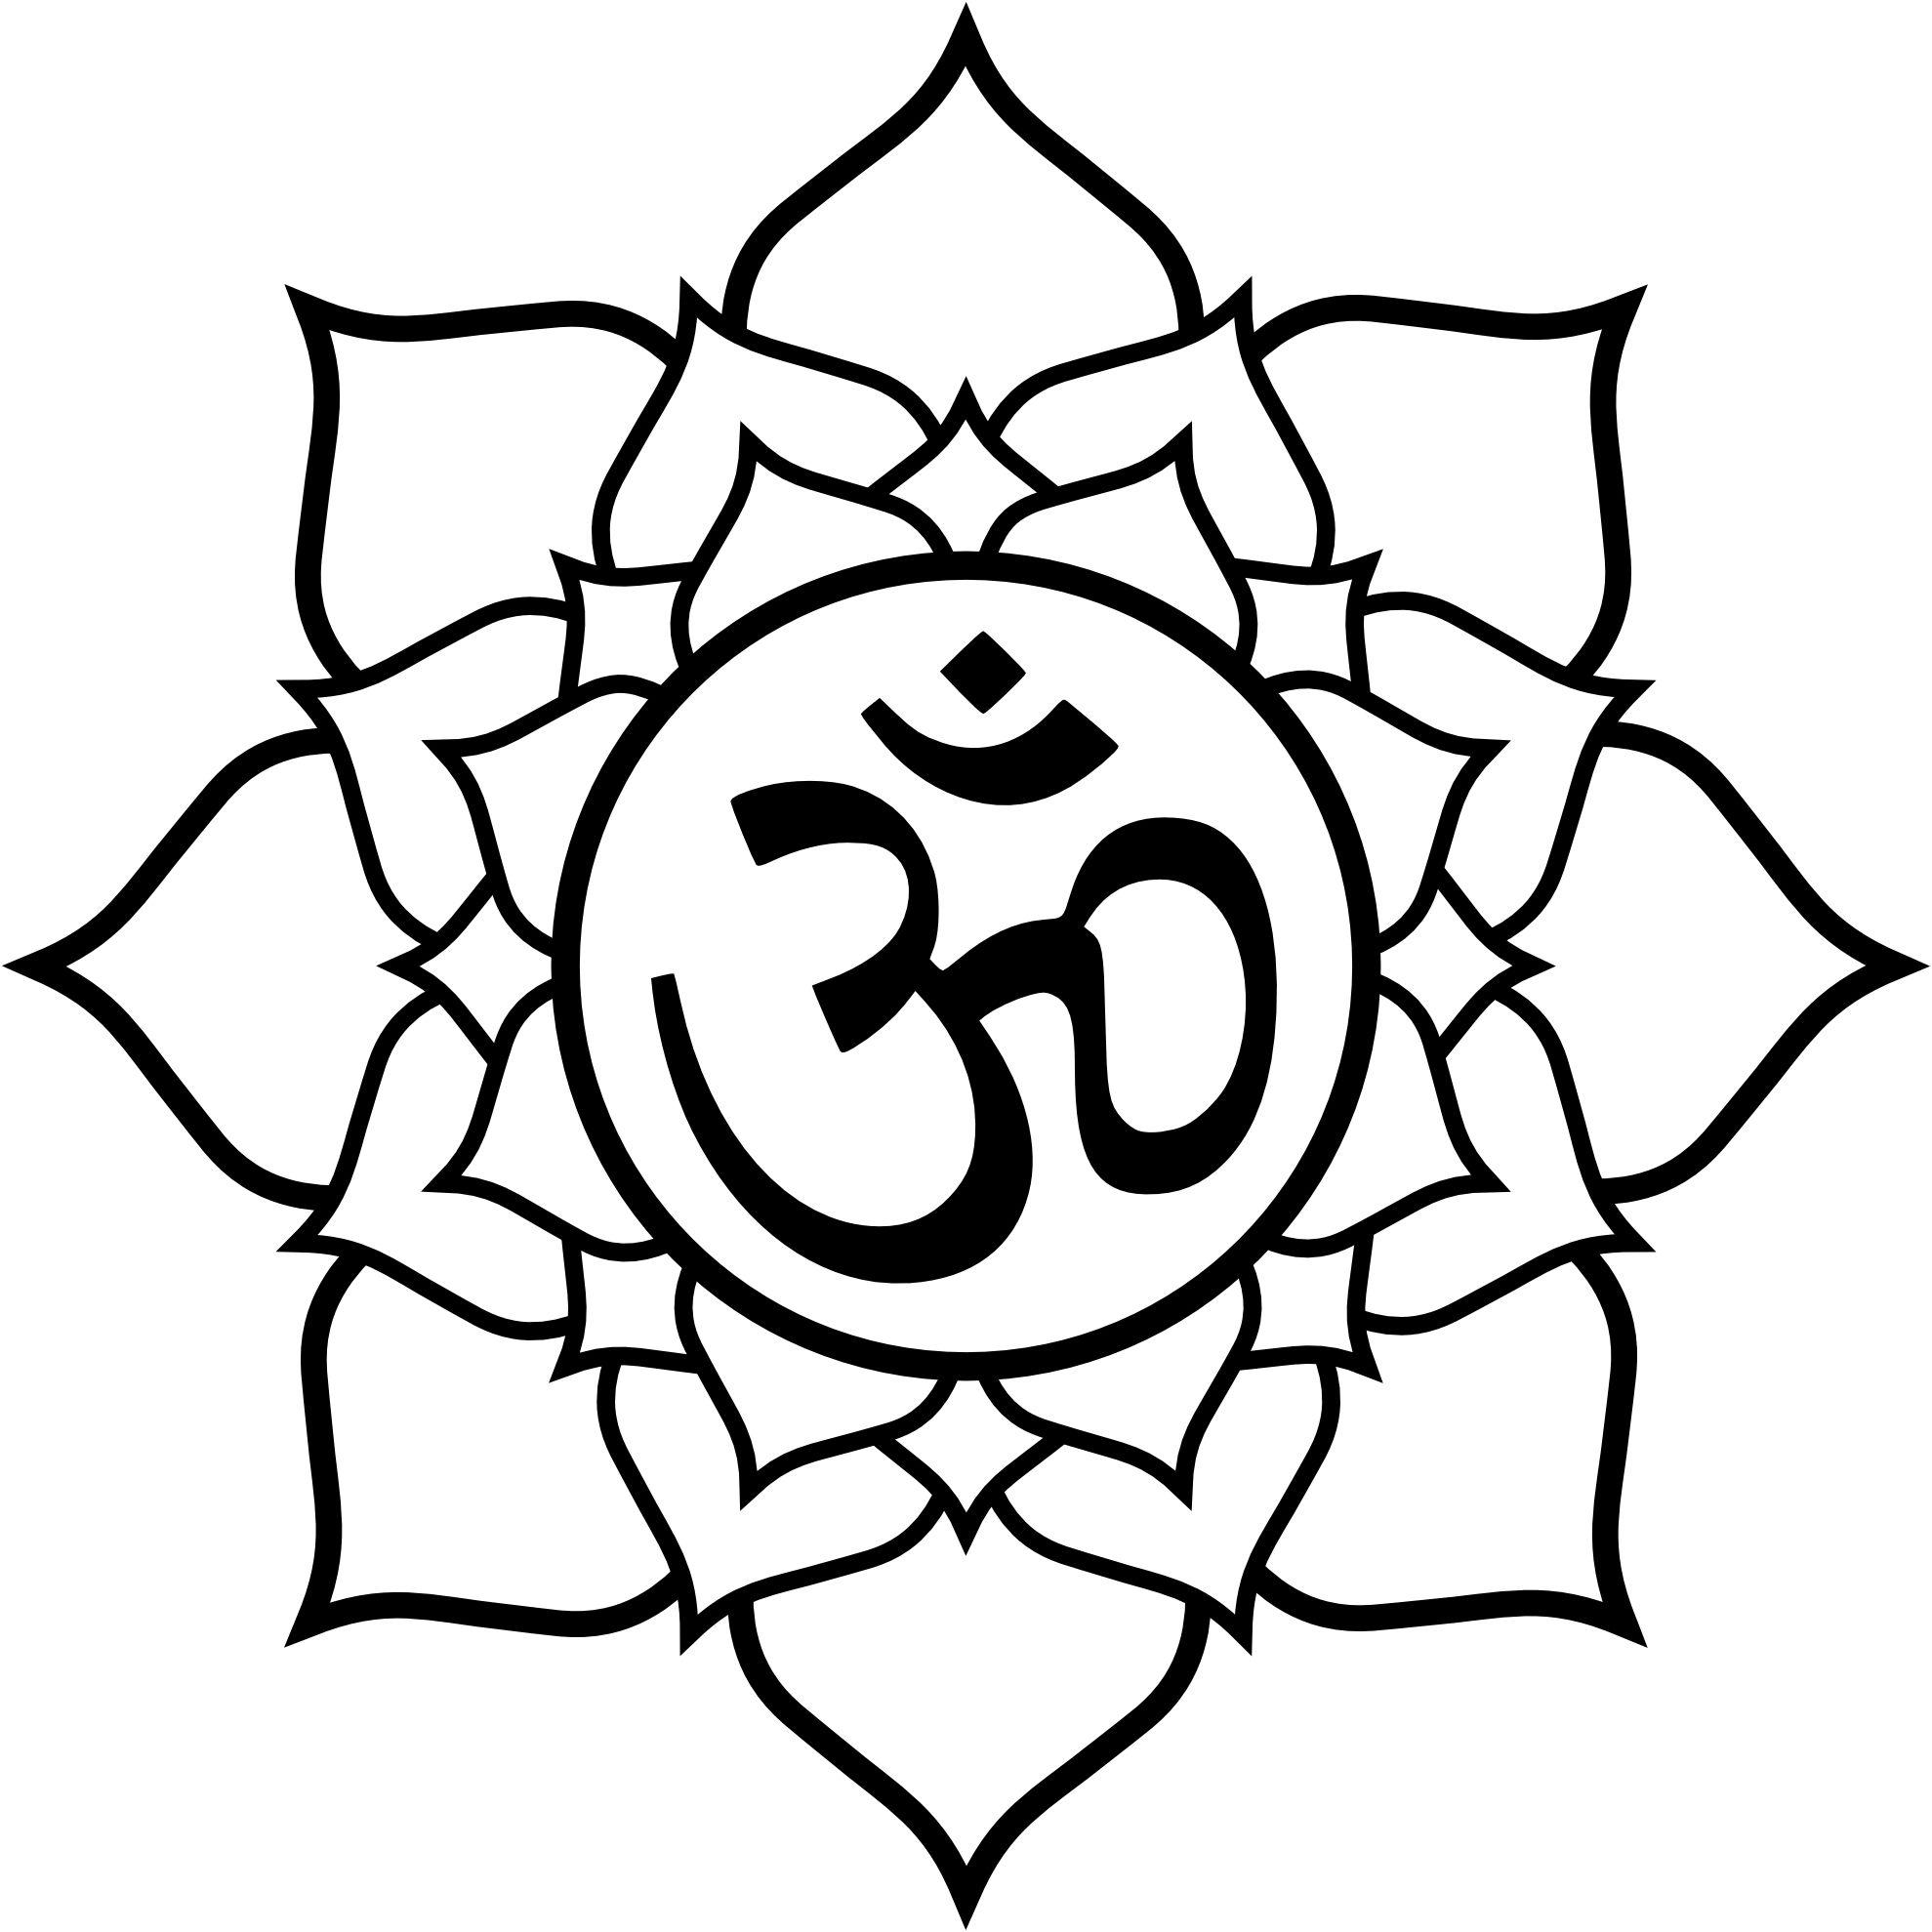 Om Mandala Tatoeage Ideeen Patronen Lotus